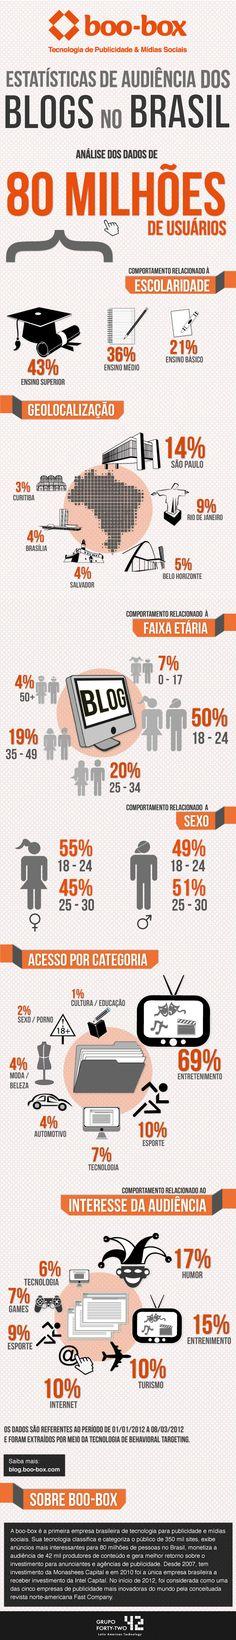 #Exclusivo. Infografico sobre audiencia dos blogs no Brasil. #midiassociais #marketingdigital